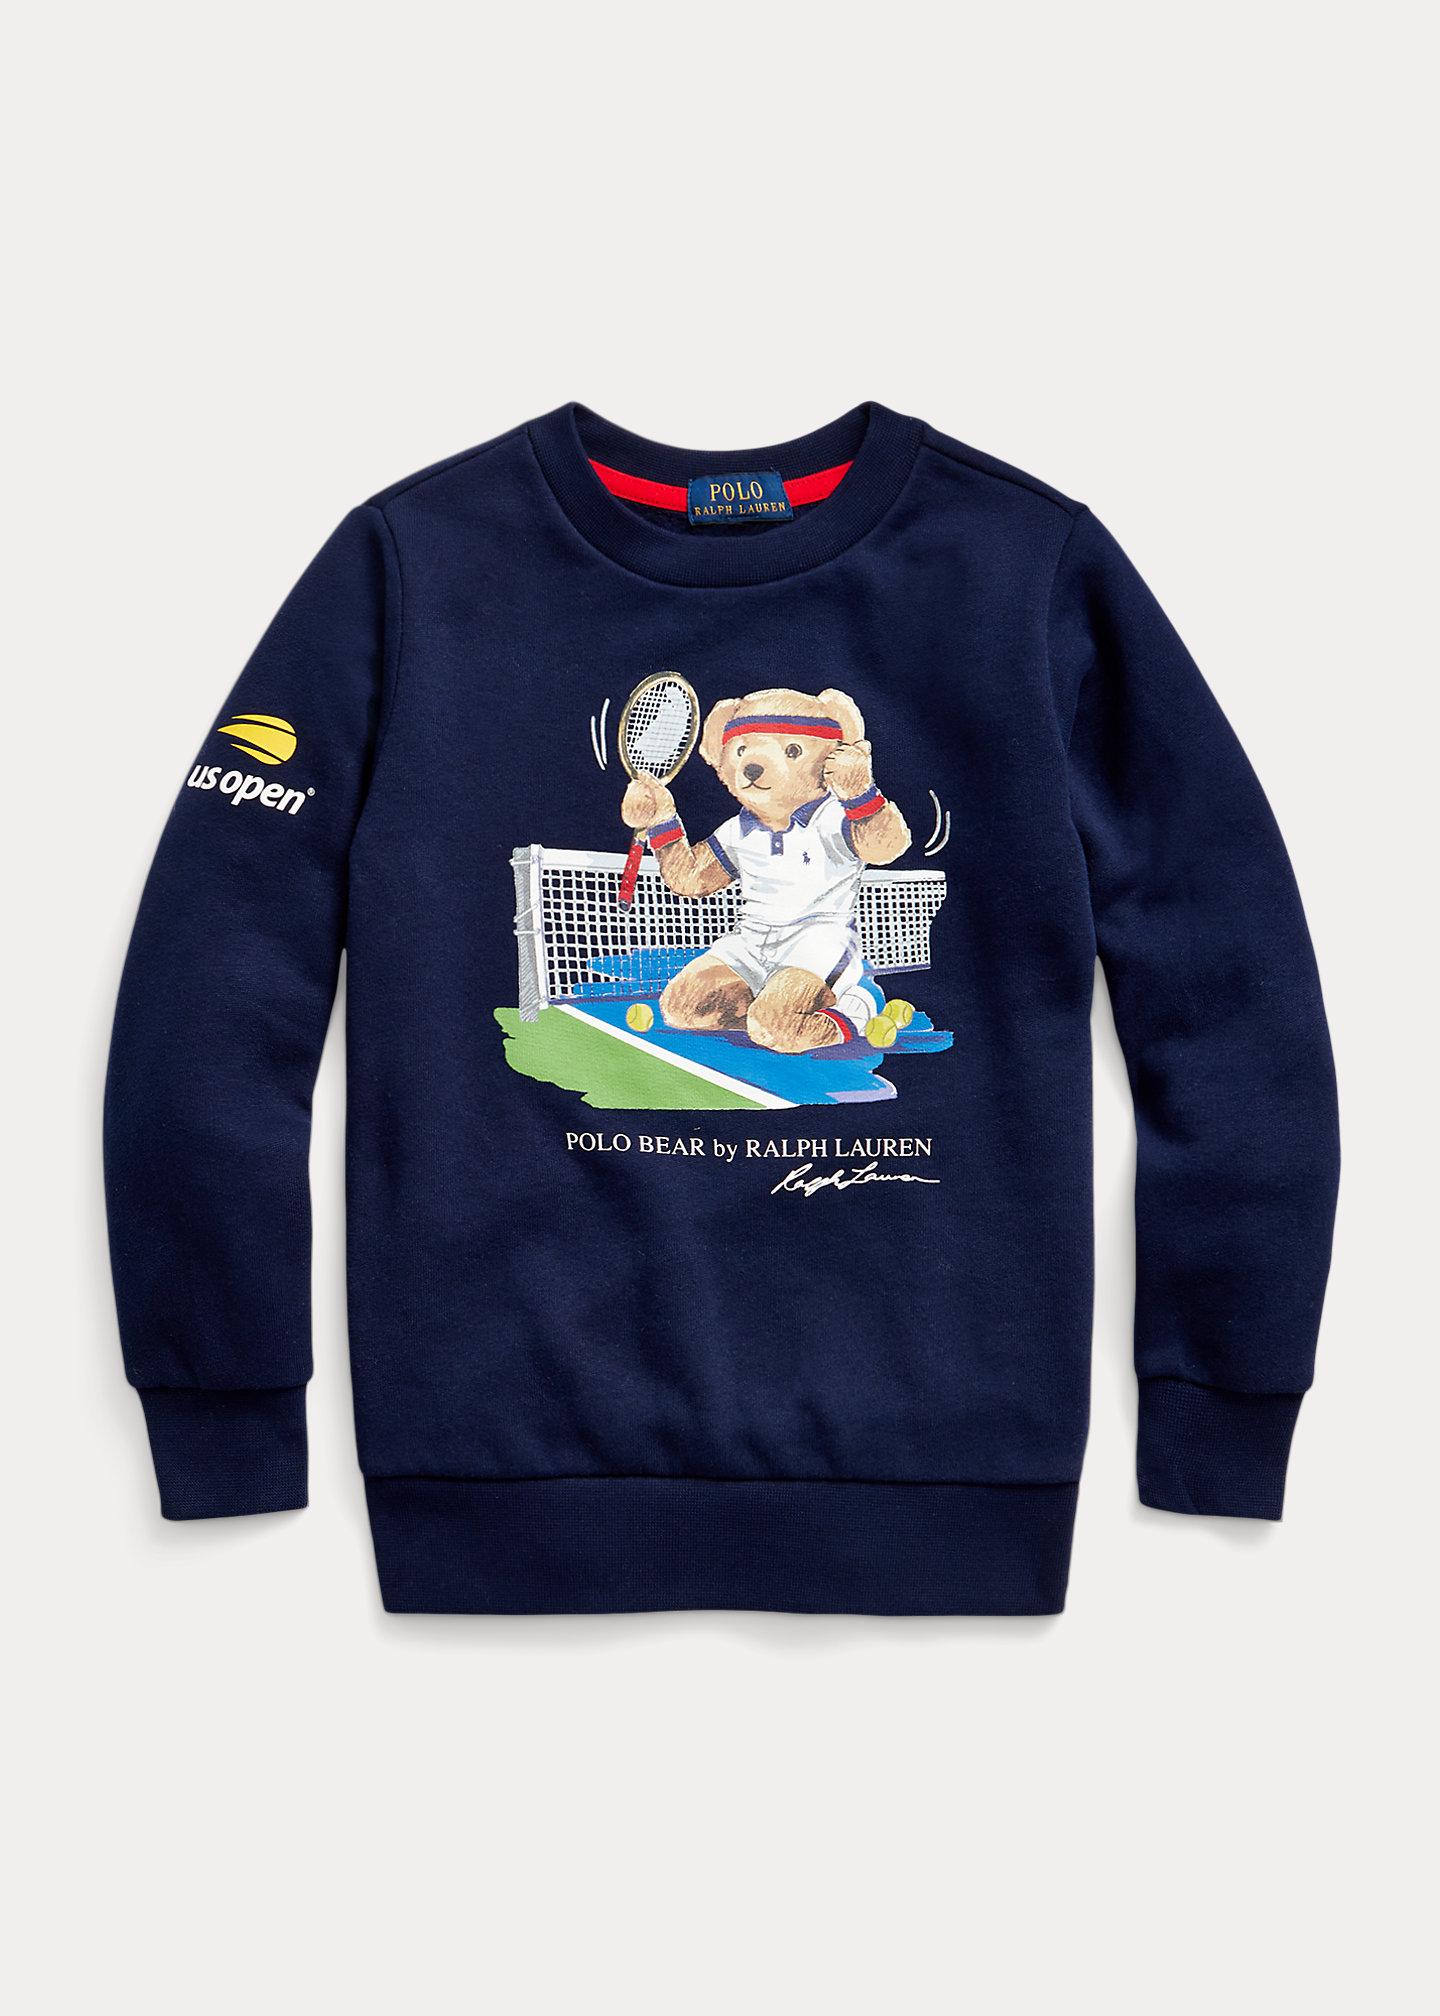 Polo Ralph Lauren US Open Polo Bear Fleece Sweatshirt